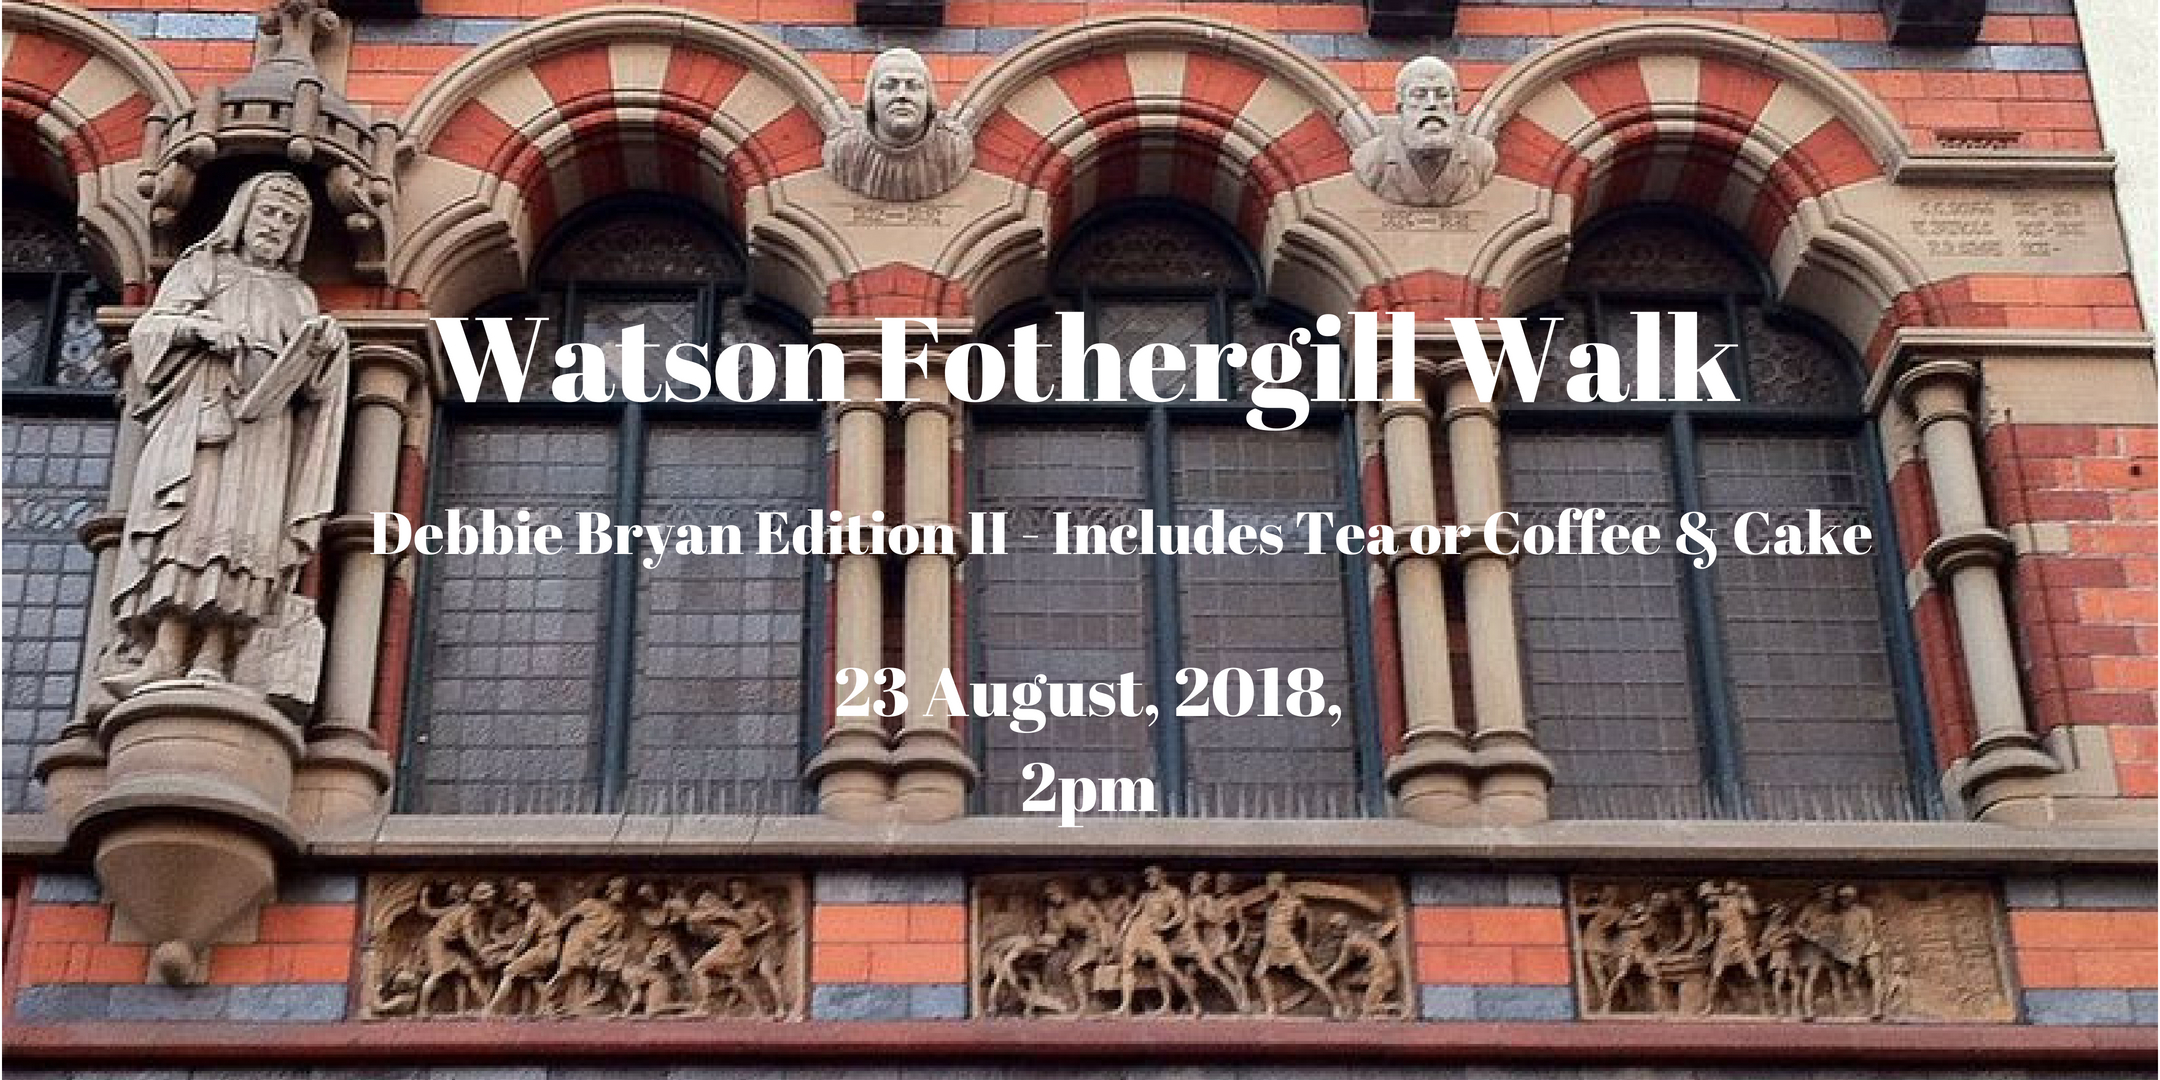 23aug DBII Watson Fothergill Walk.jpg